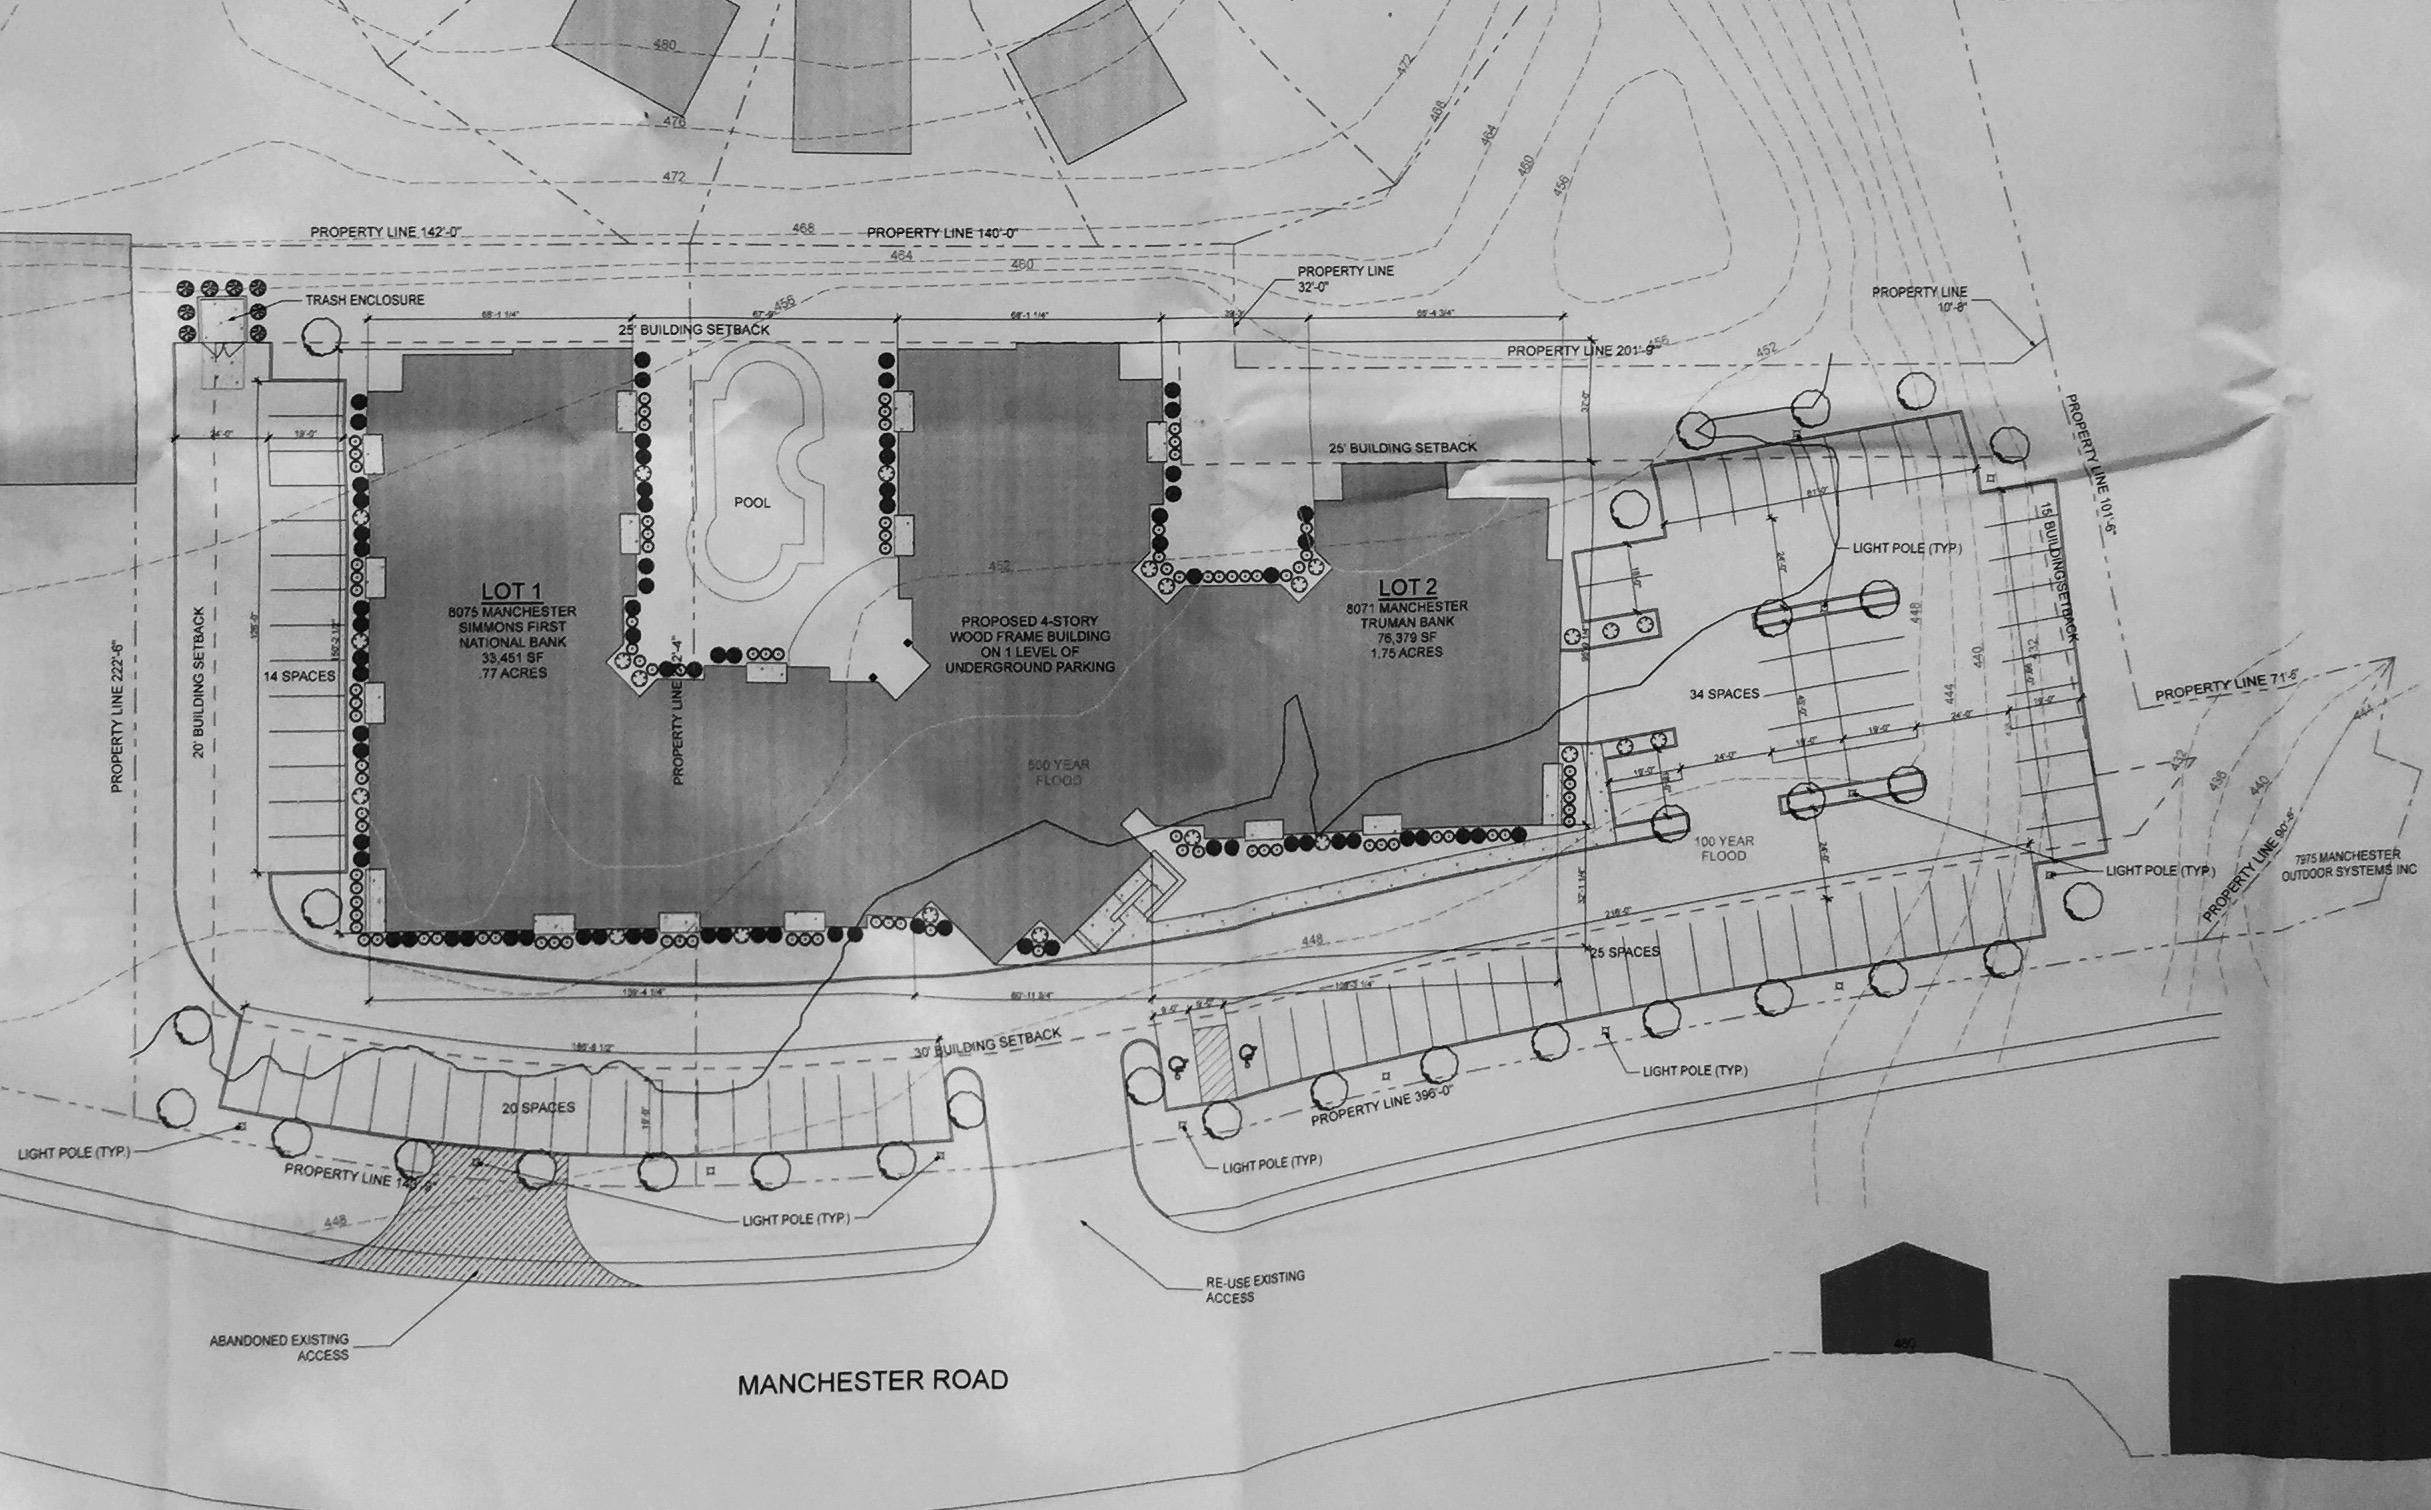 Plans Presented for 108-Unit Apartment Development at Manchester-Hanley